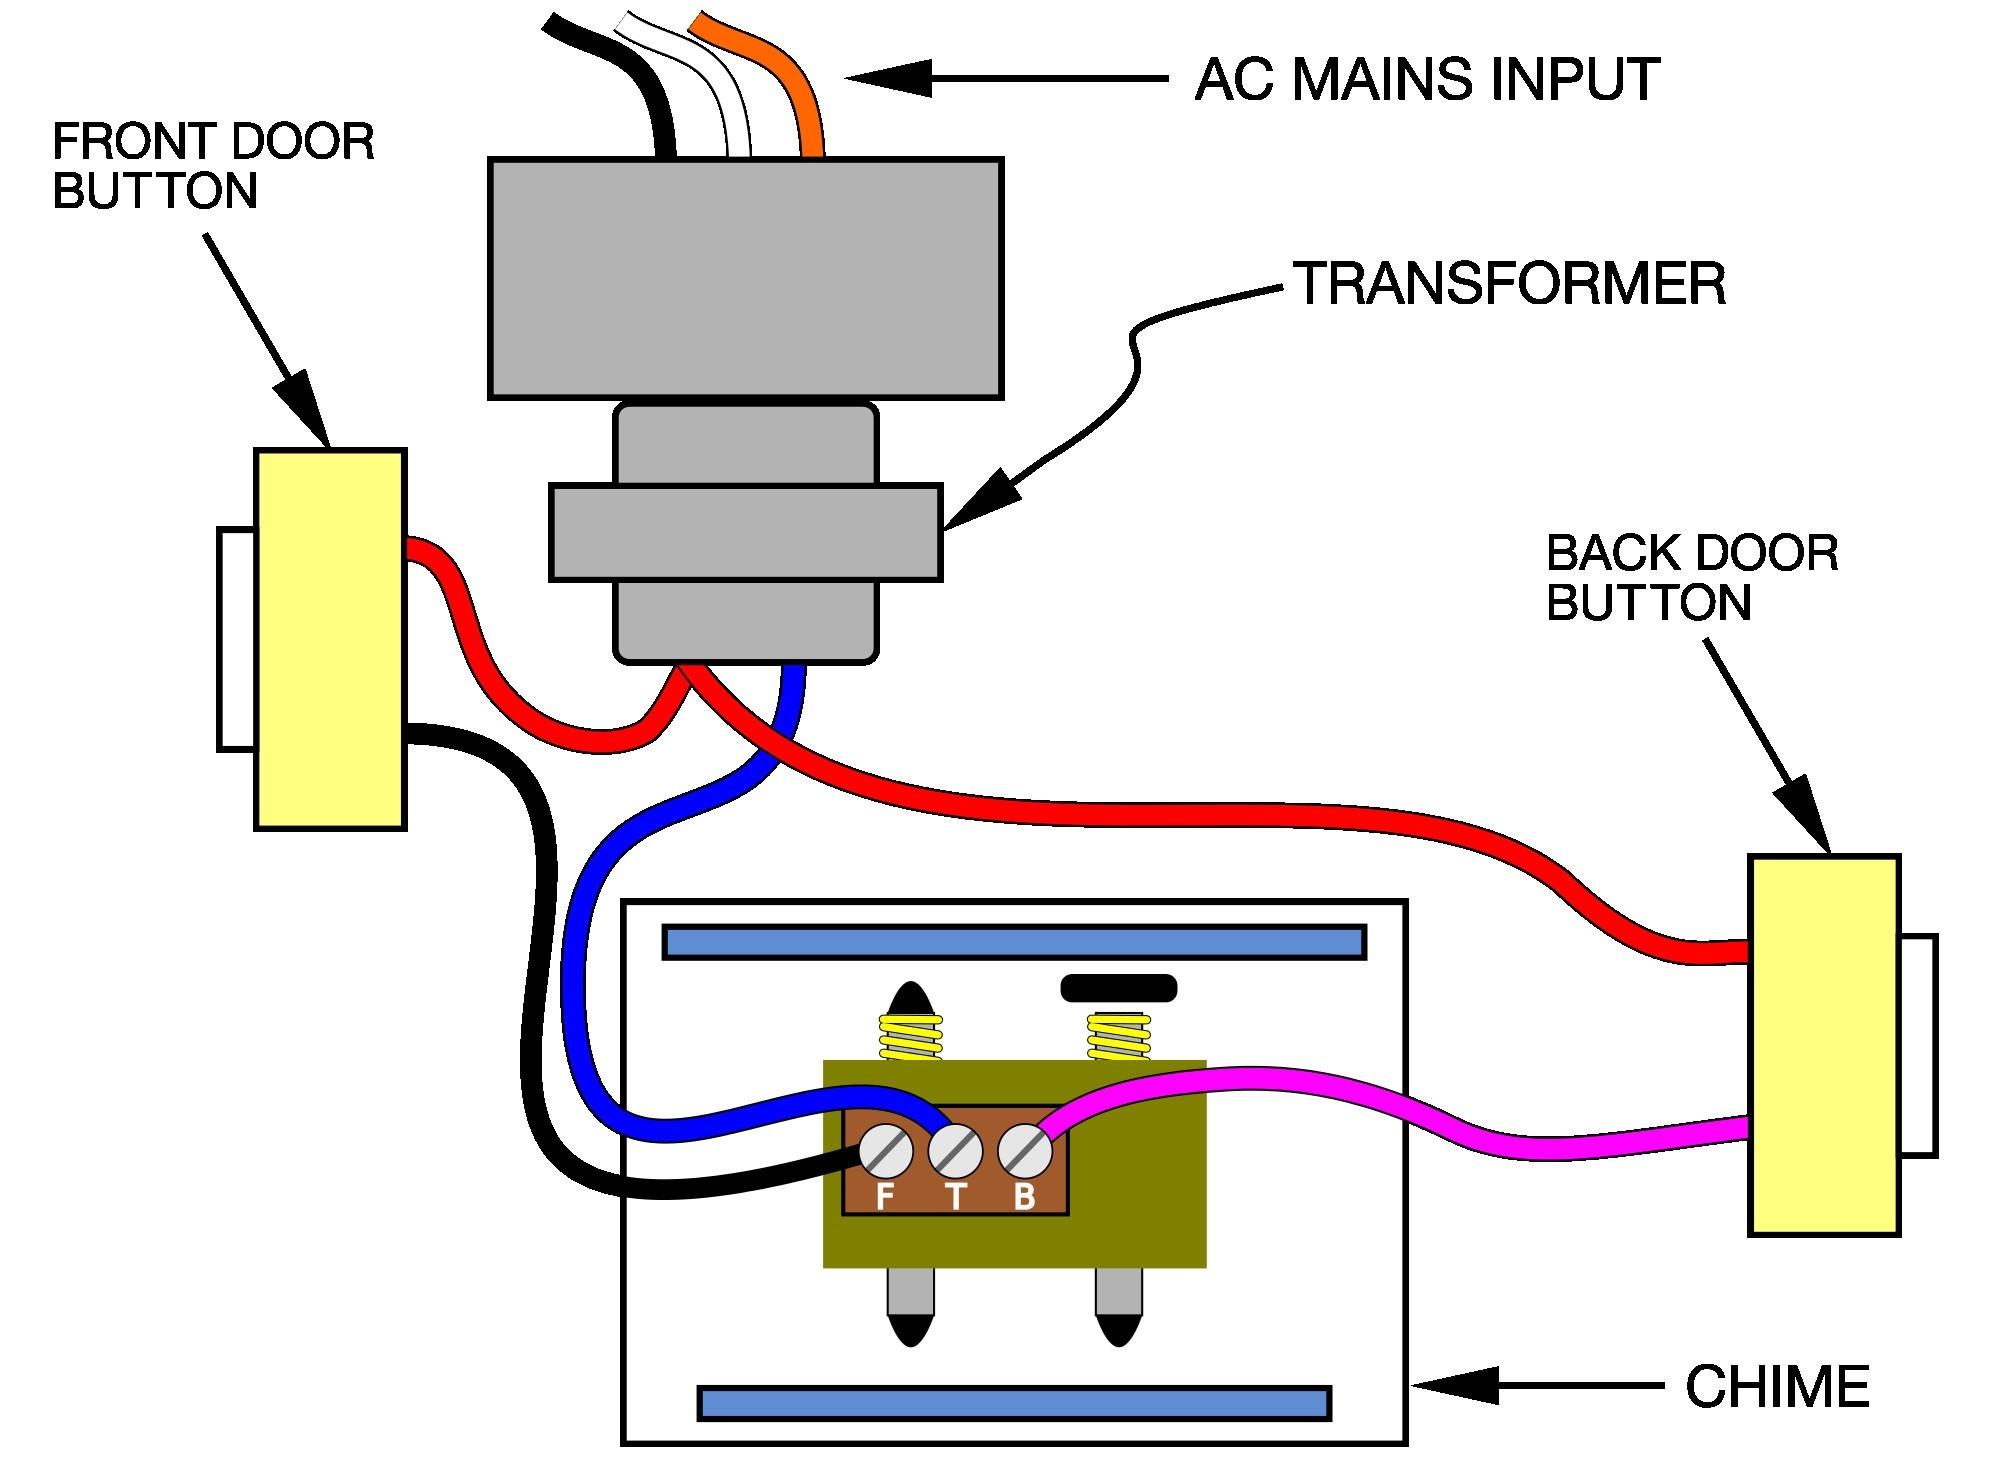 hight resolution of nutone doorbell wiring diagram wiring diagram for nutone doorbell new wiring diagram for doorbell transformer